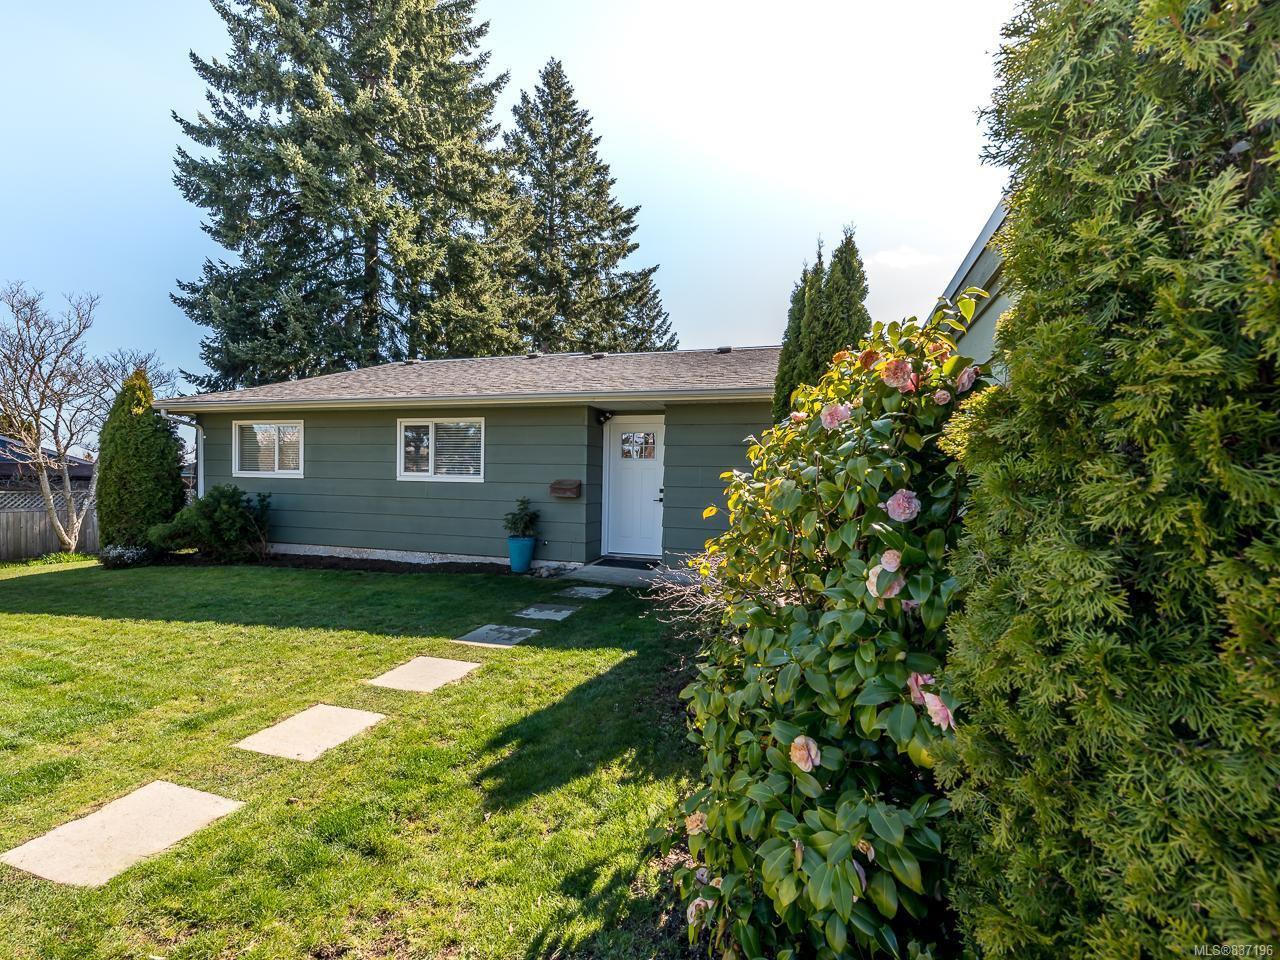 Main Photo: 568 Bambrick Pl in COMOX: CV Comox (Town of) House for sale (Comox Valley)  : MLS®# 837196